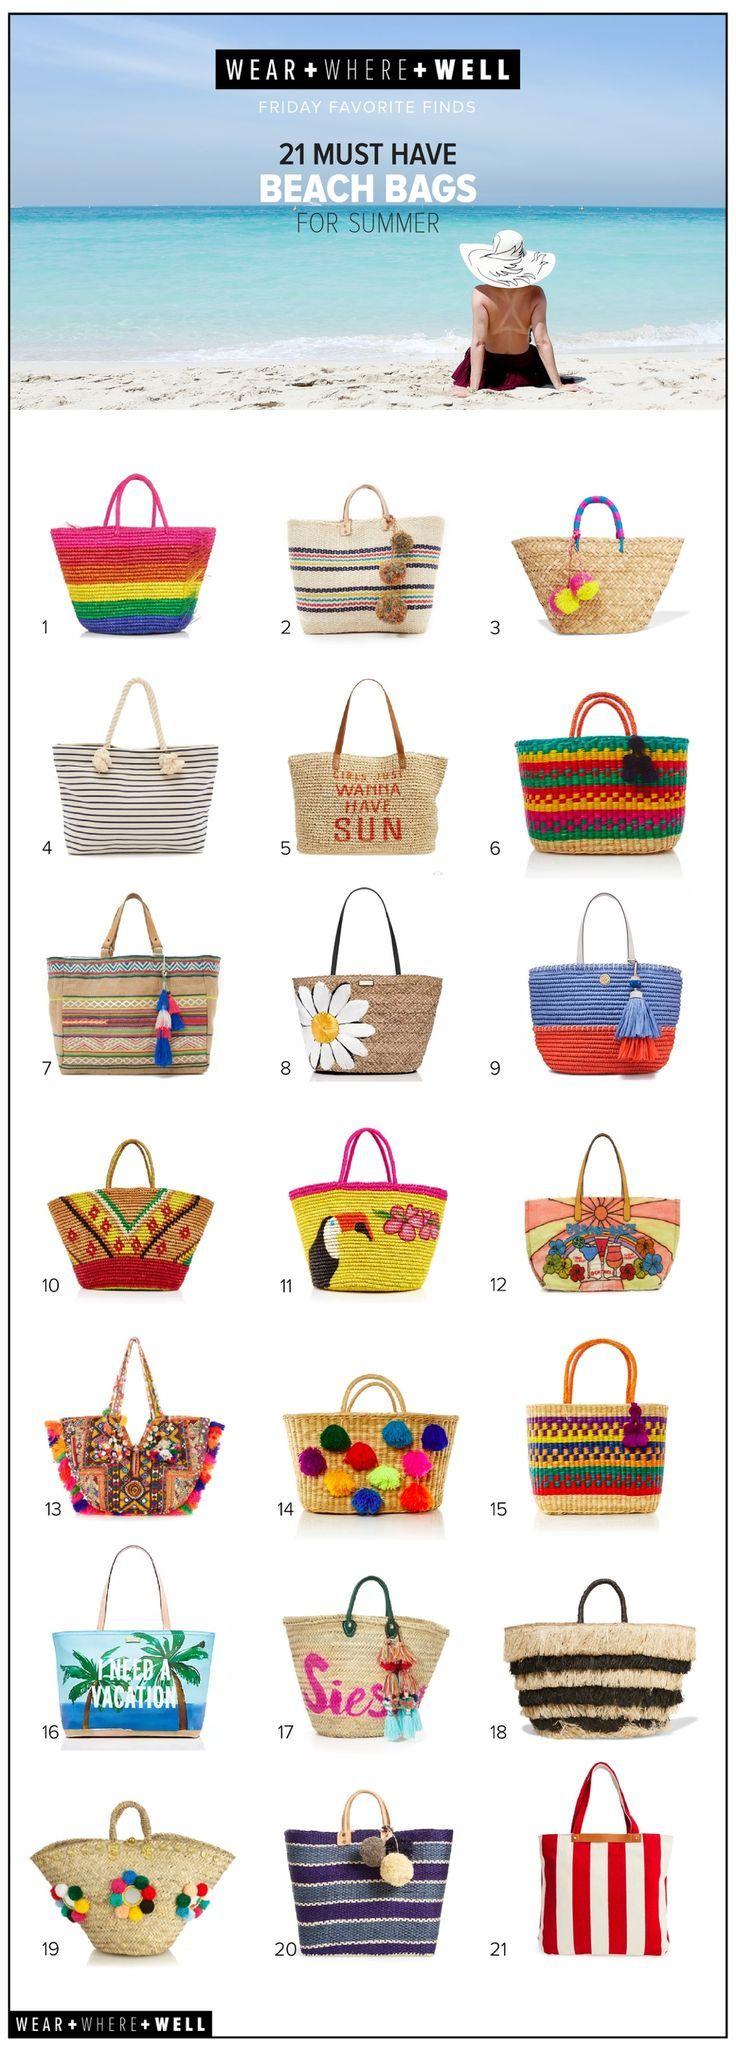 follow me cushite wear where well 21 best beach bags for summer